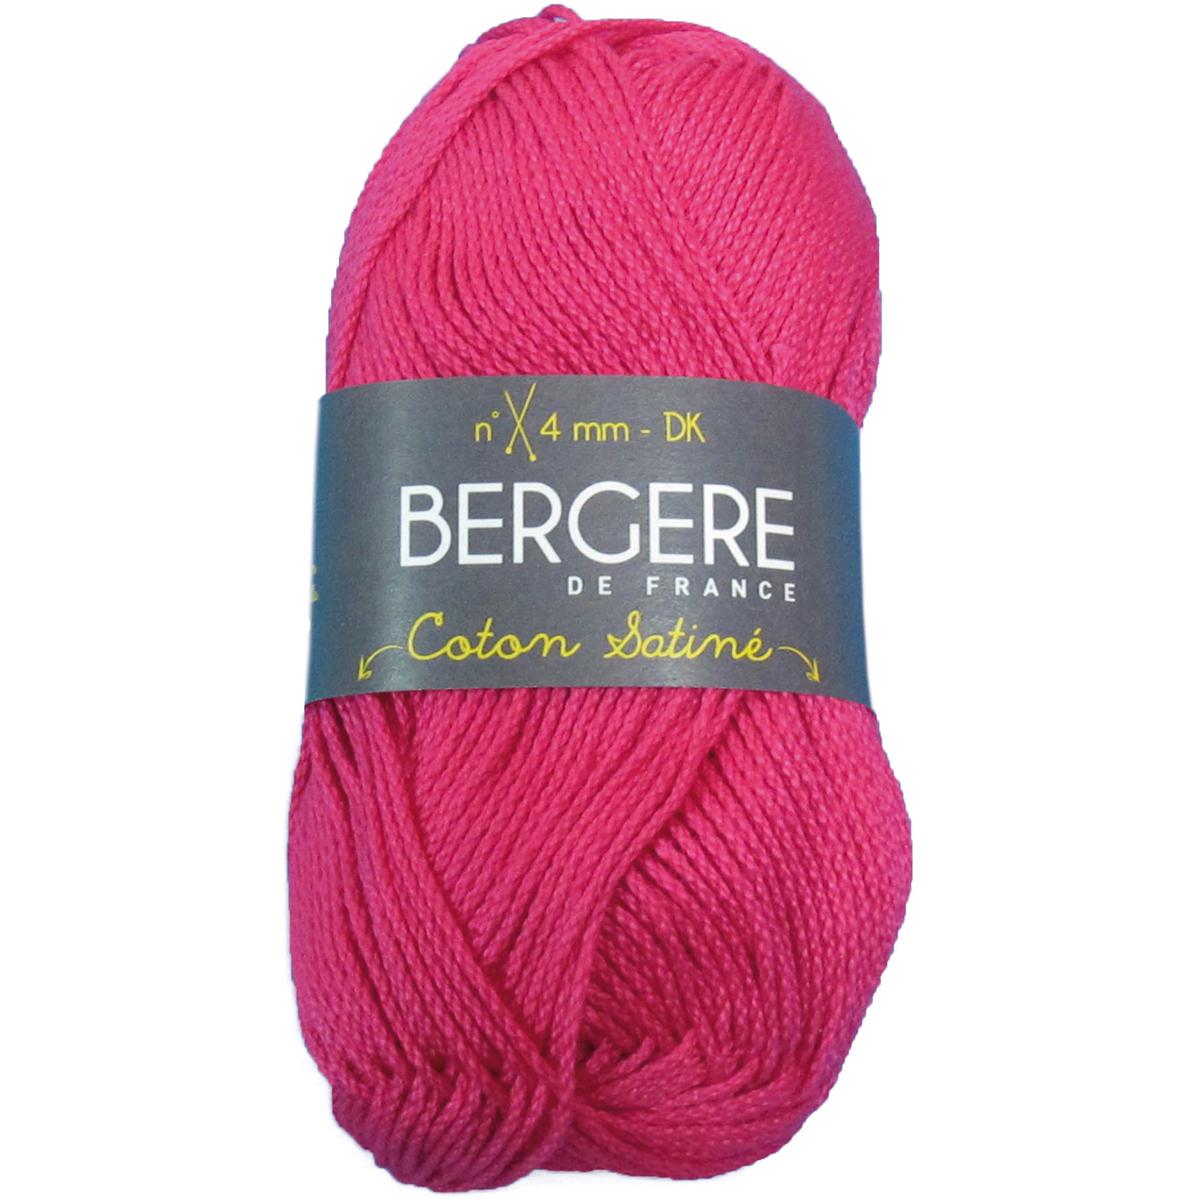 Bergere De France Coton Satine YarnFushia